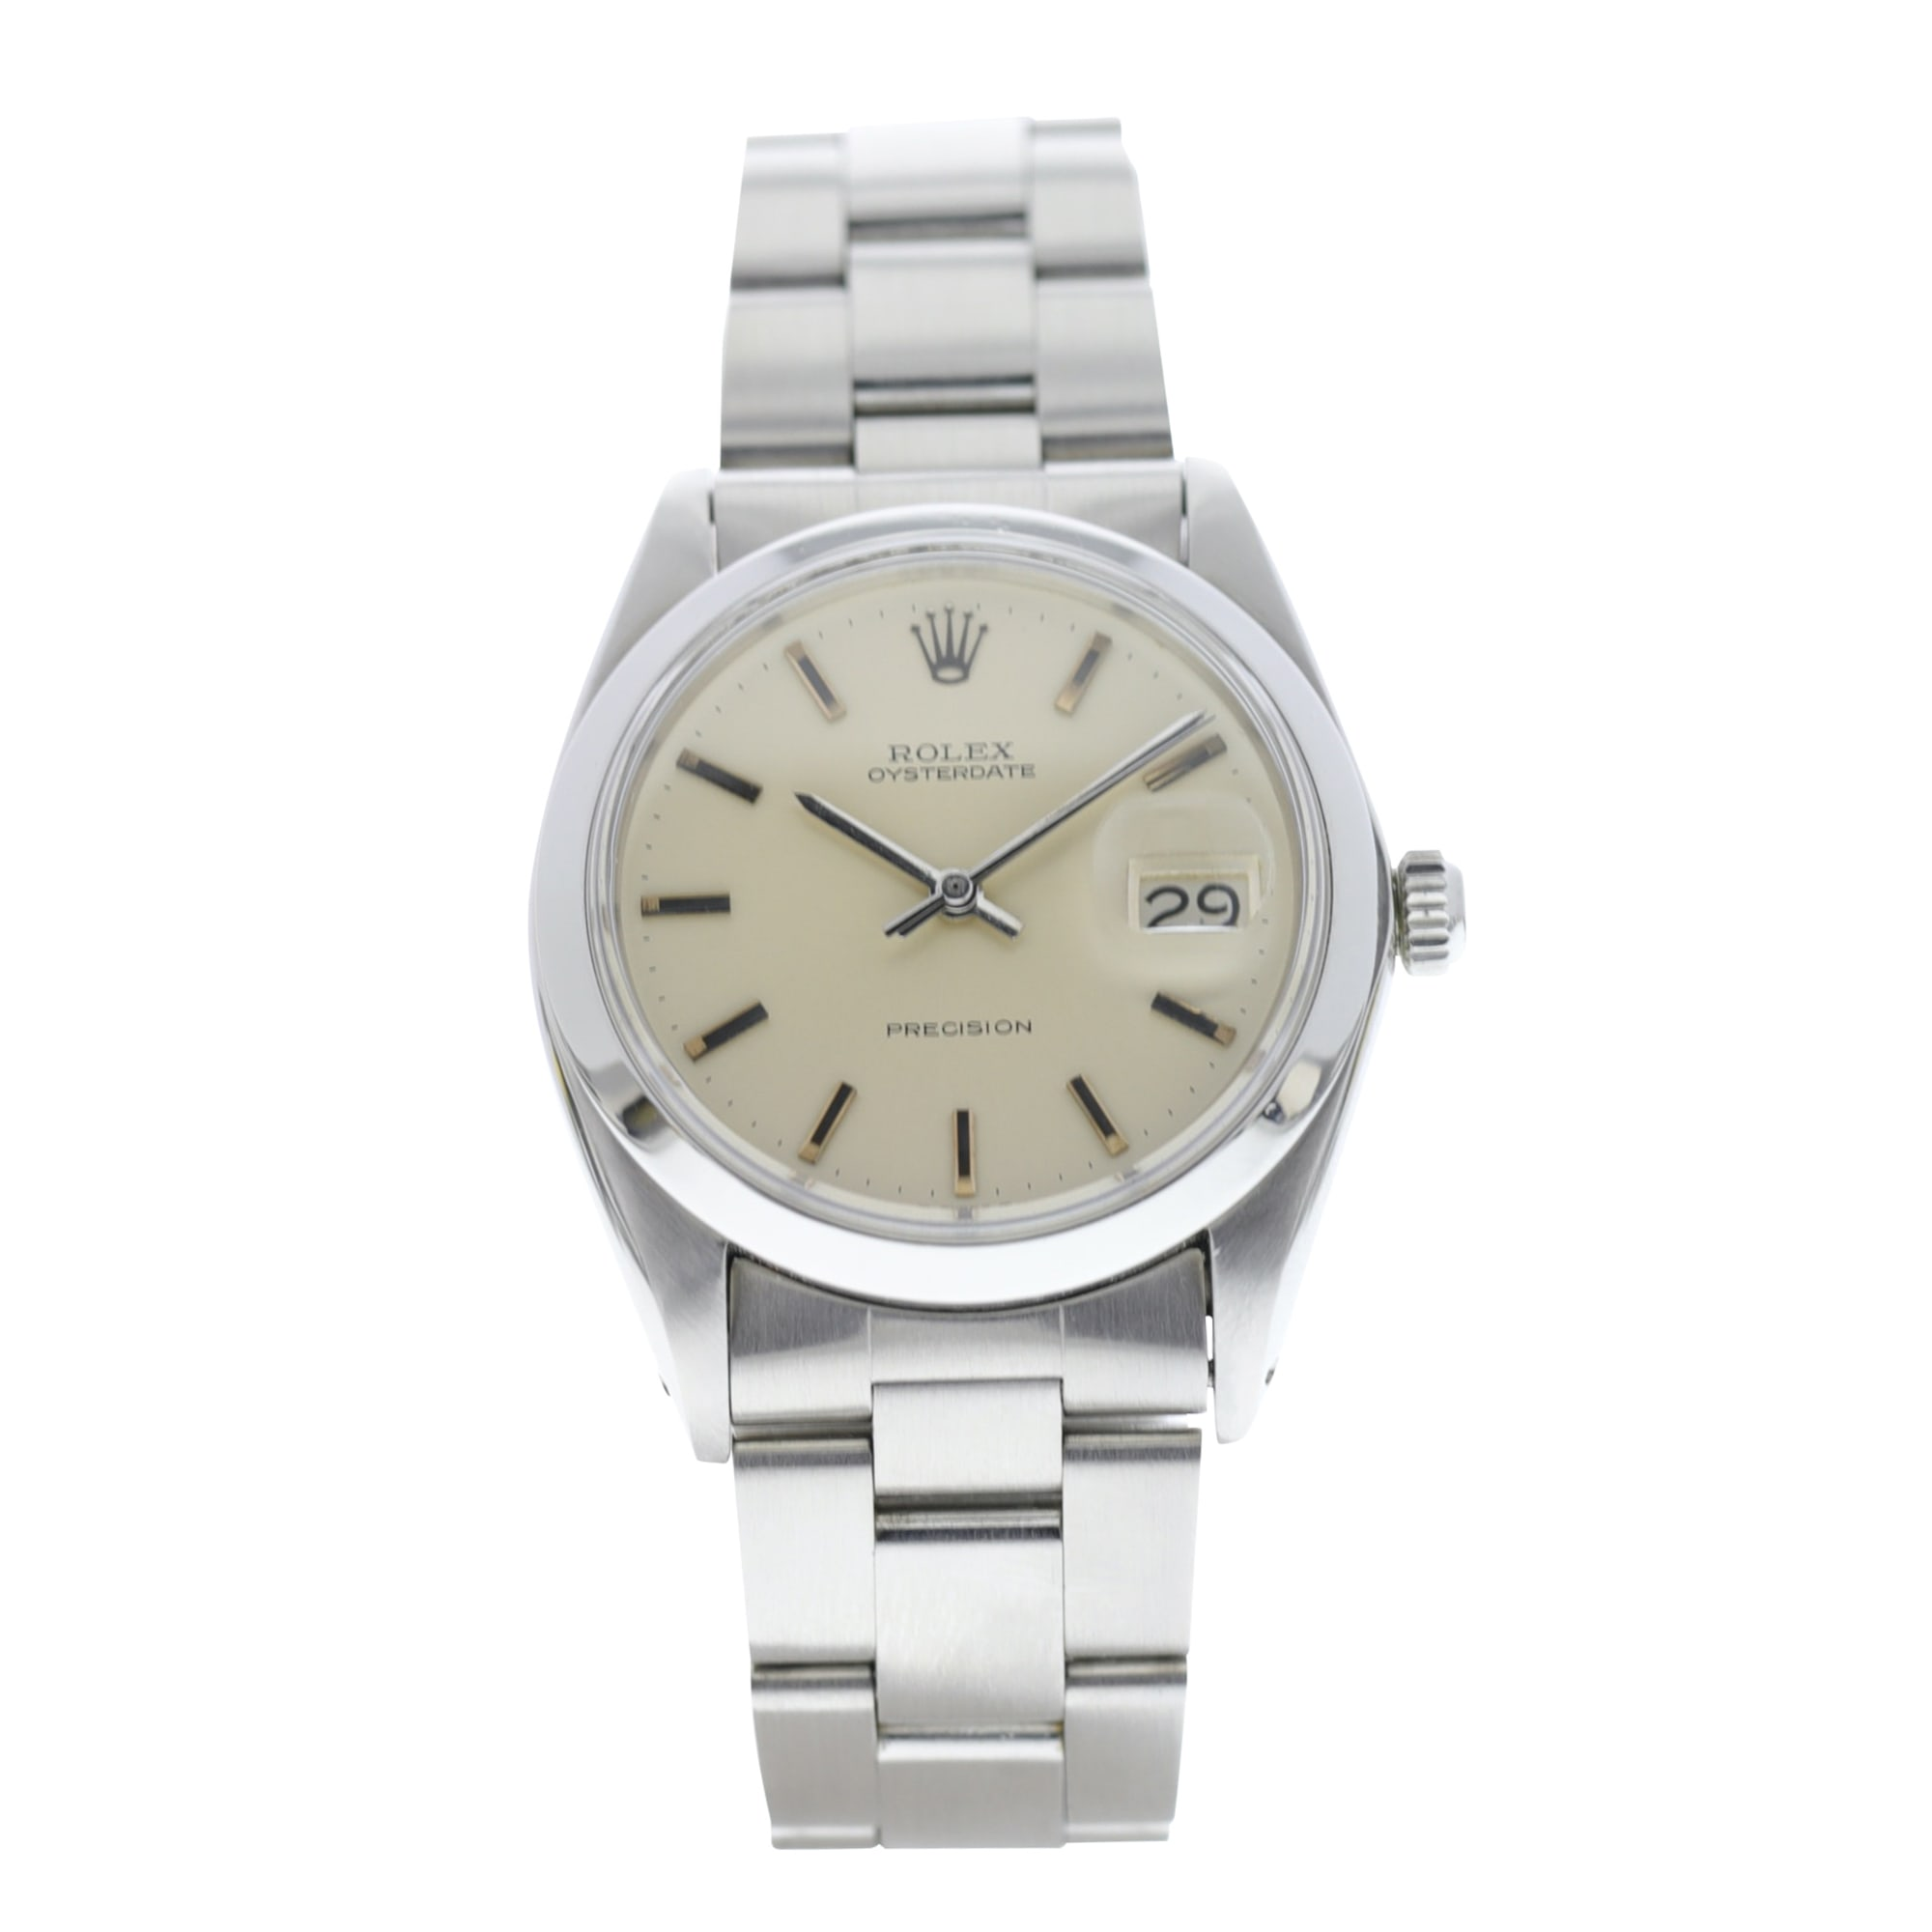 Wrist Watch ROLEX OYSTER PERPETUAL Silver